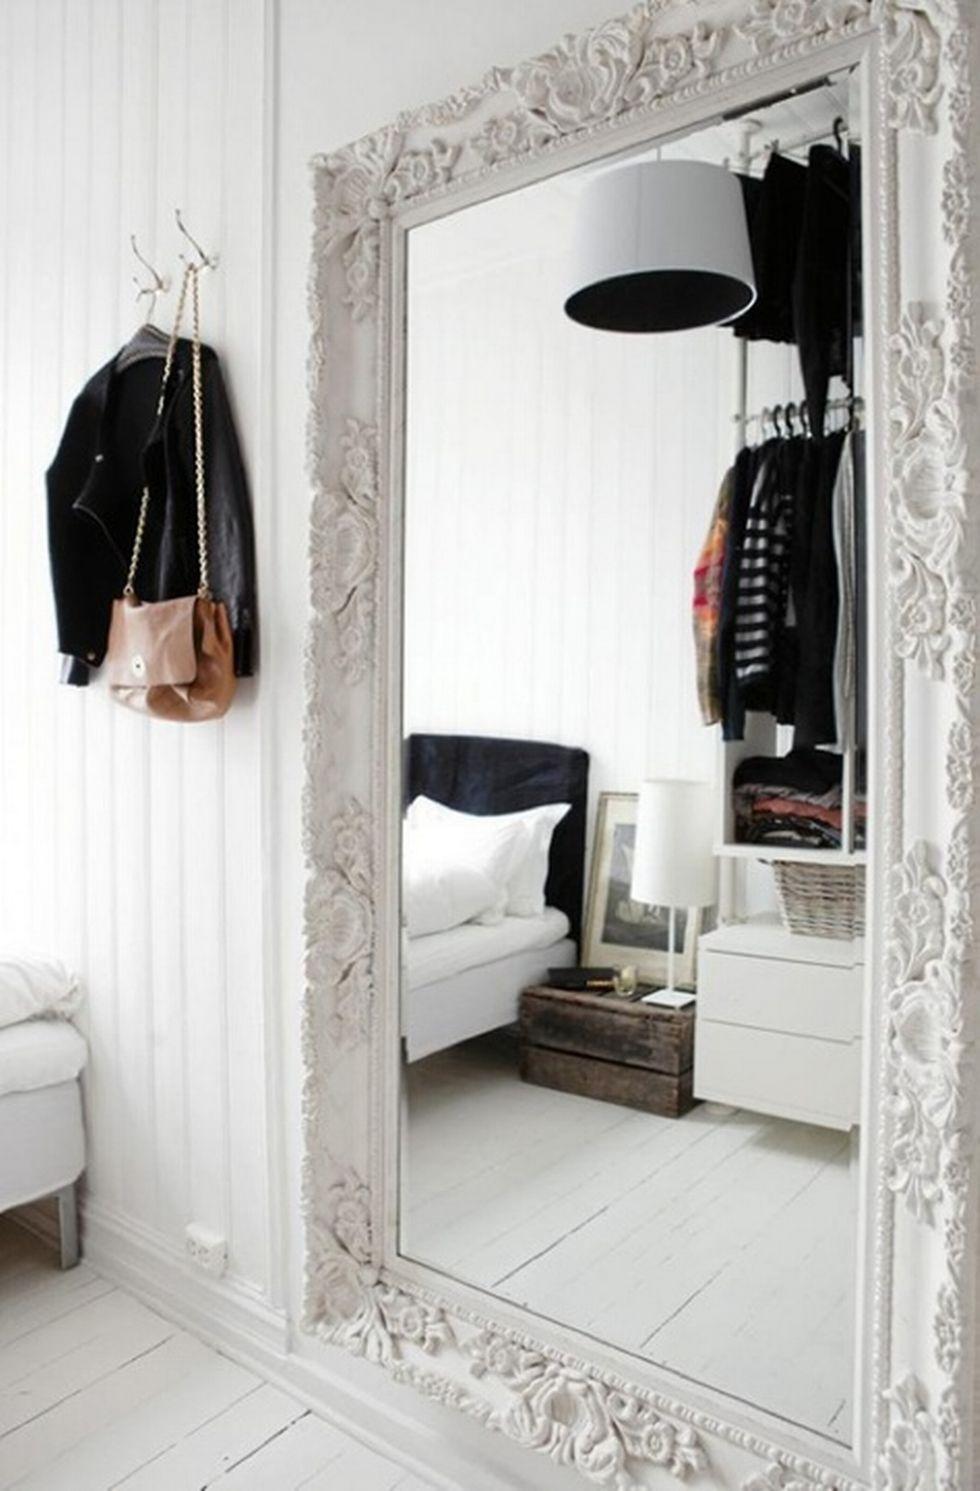 Magnificent Interior Designs with Big, Big Mirrors